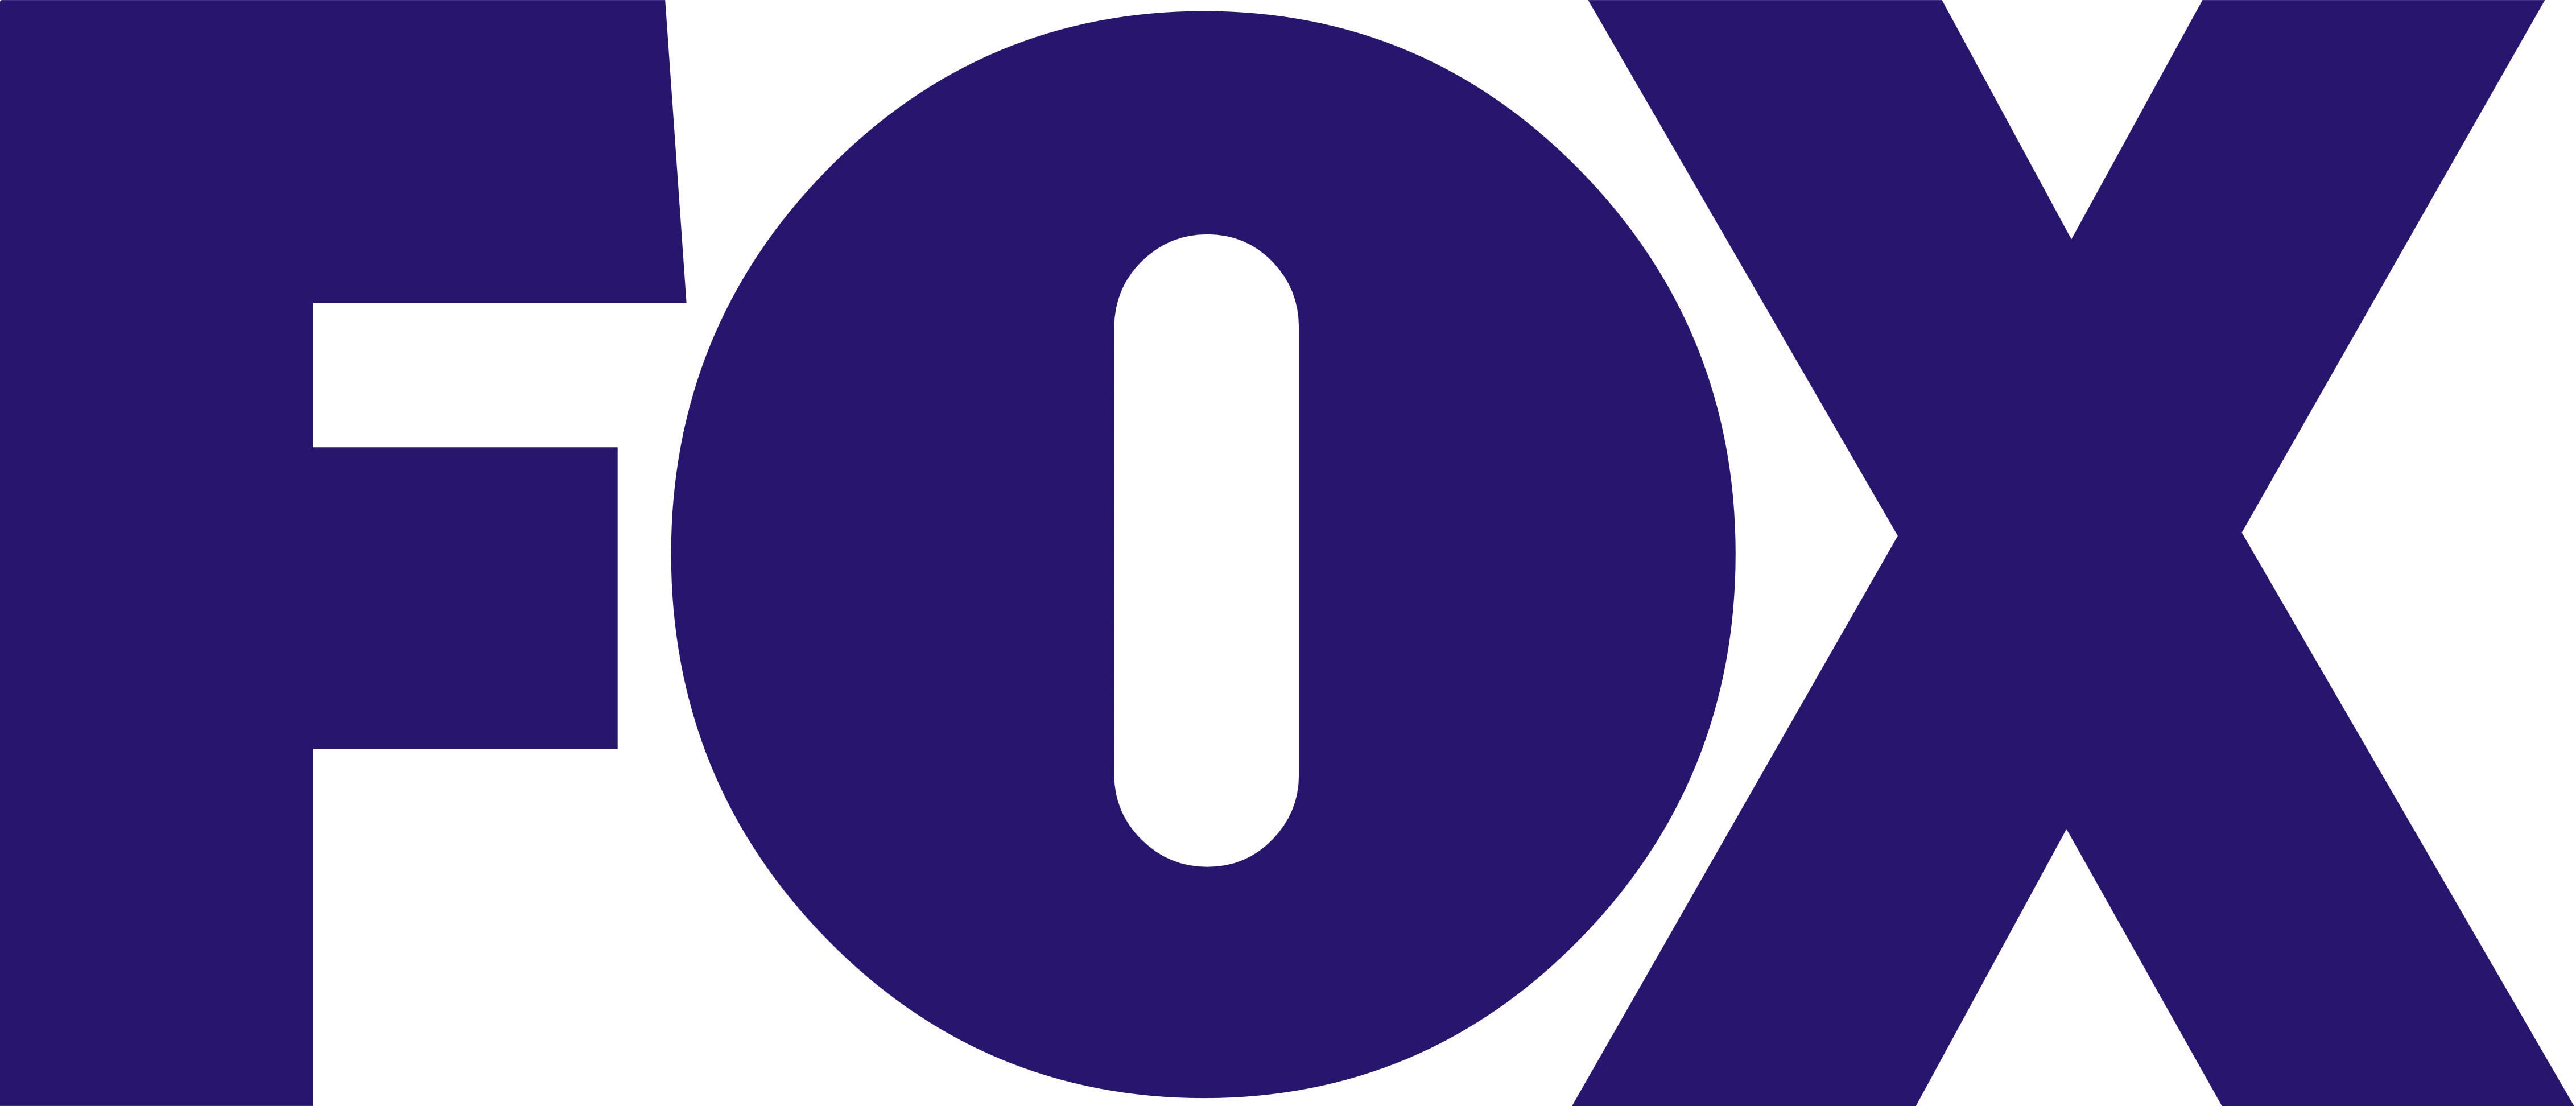 Fox Logos Download